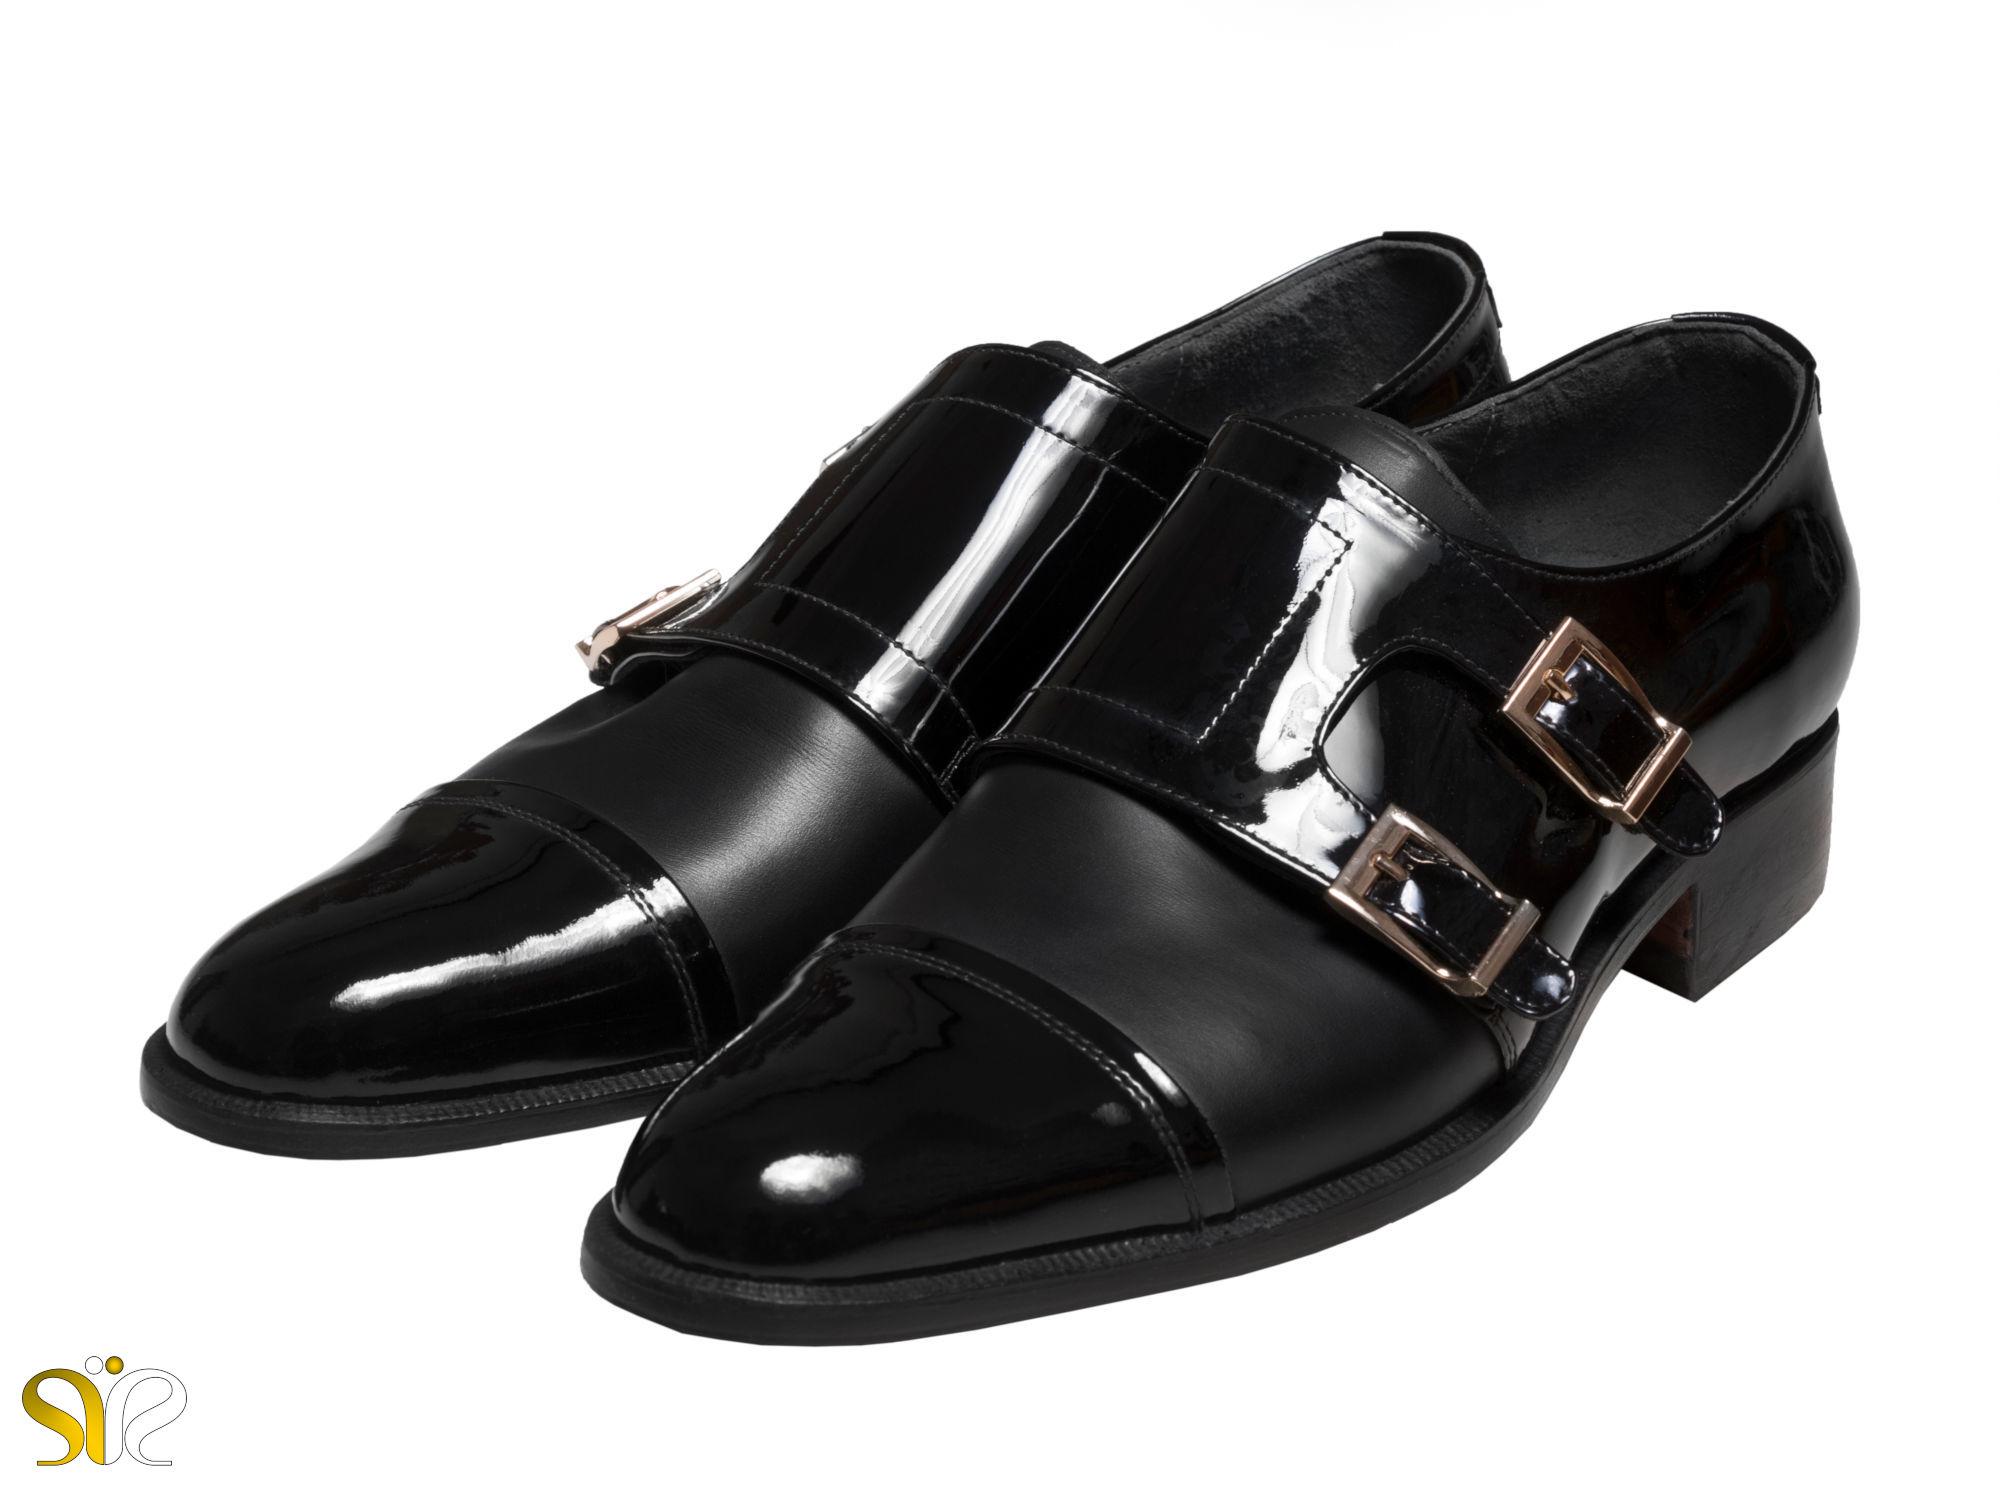 عکس مدل کفش شیک مردانه ورنی مات پاندورا - کفش - پاندورا